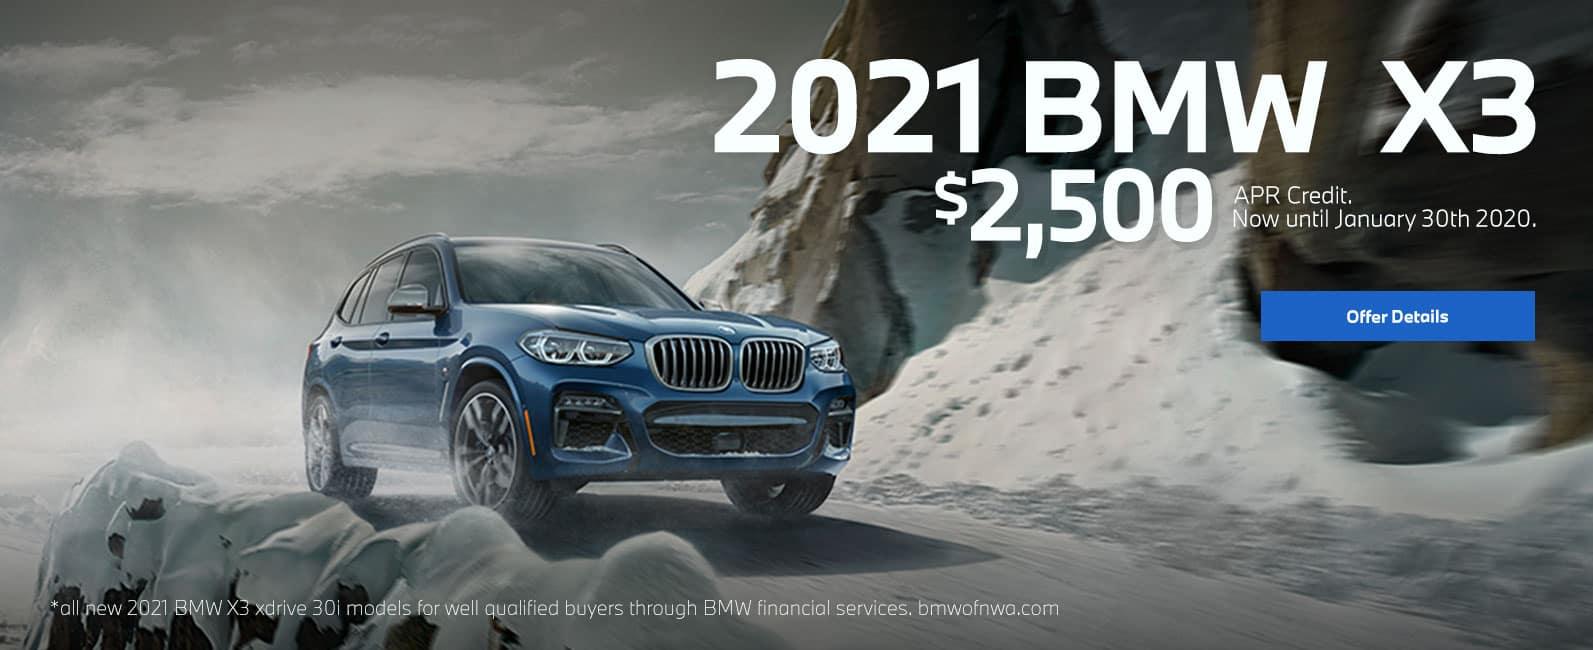 2021 x3 $2500 appr credit